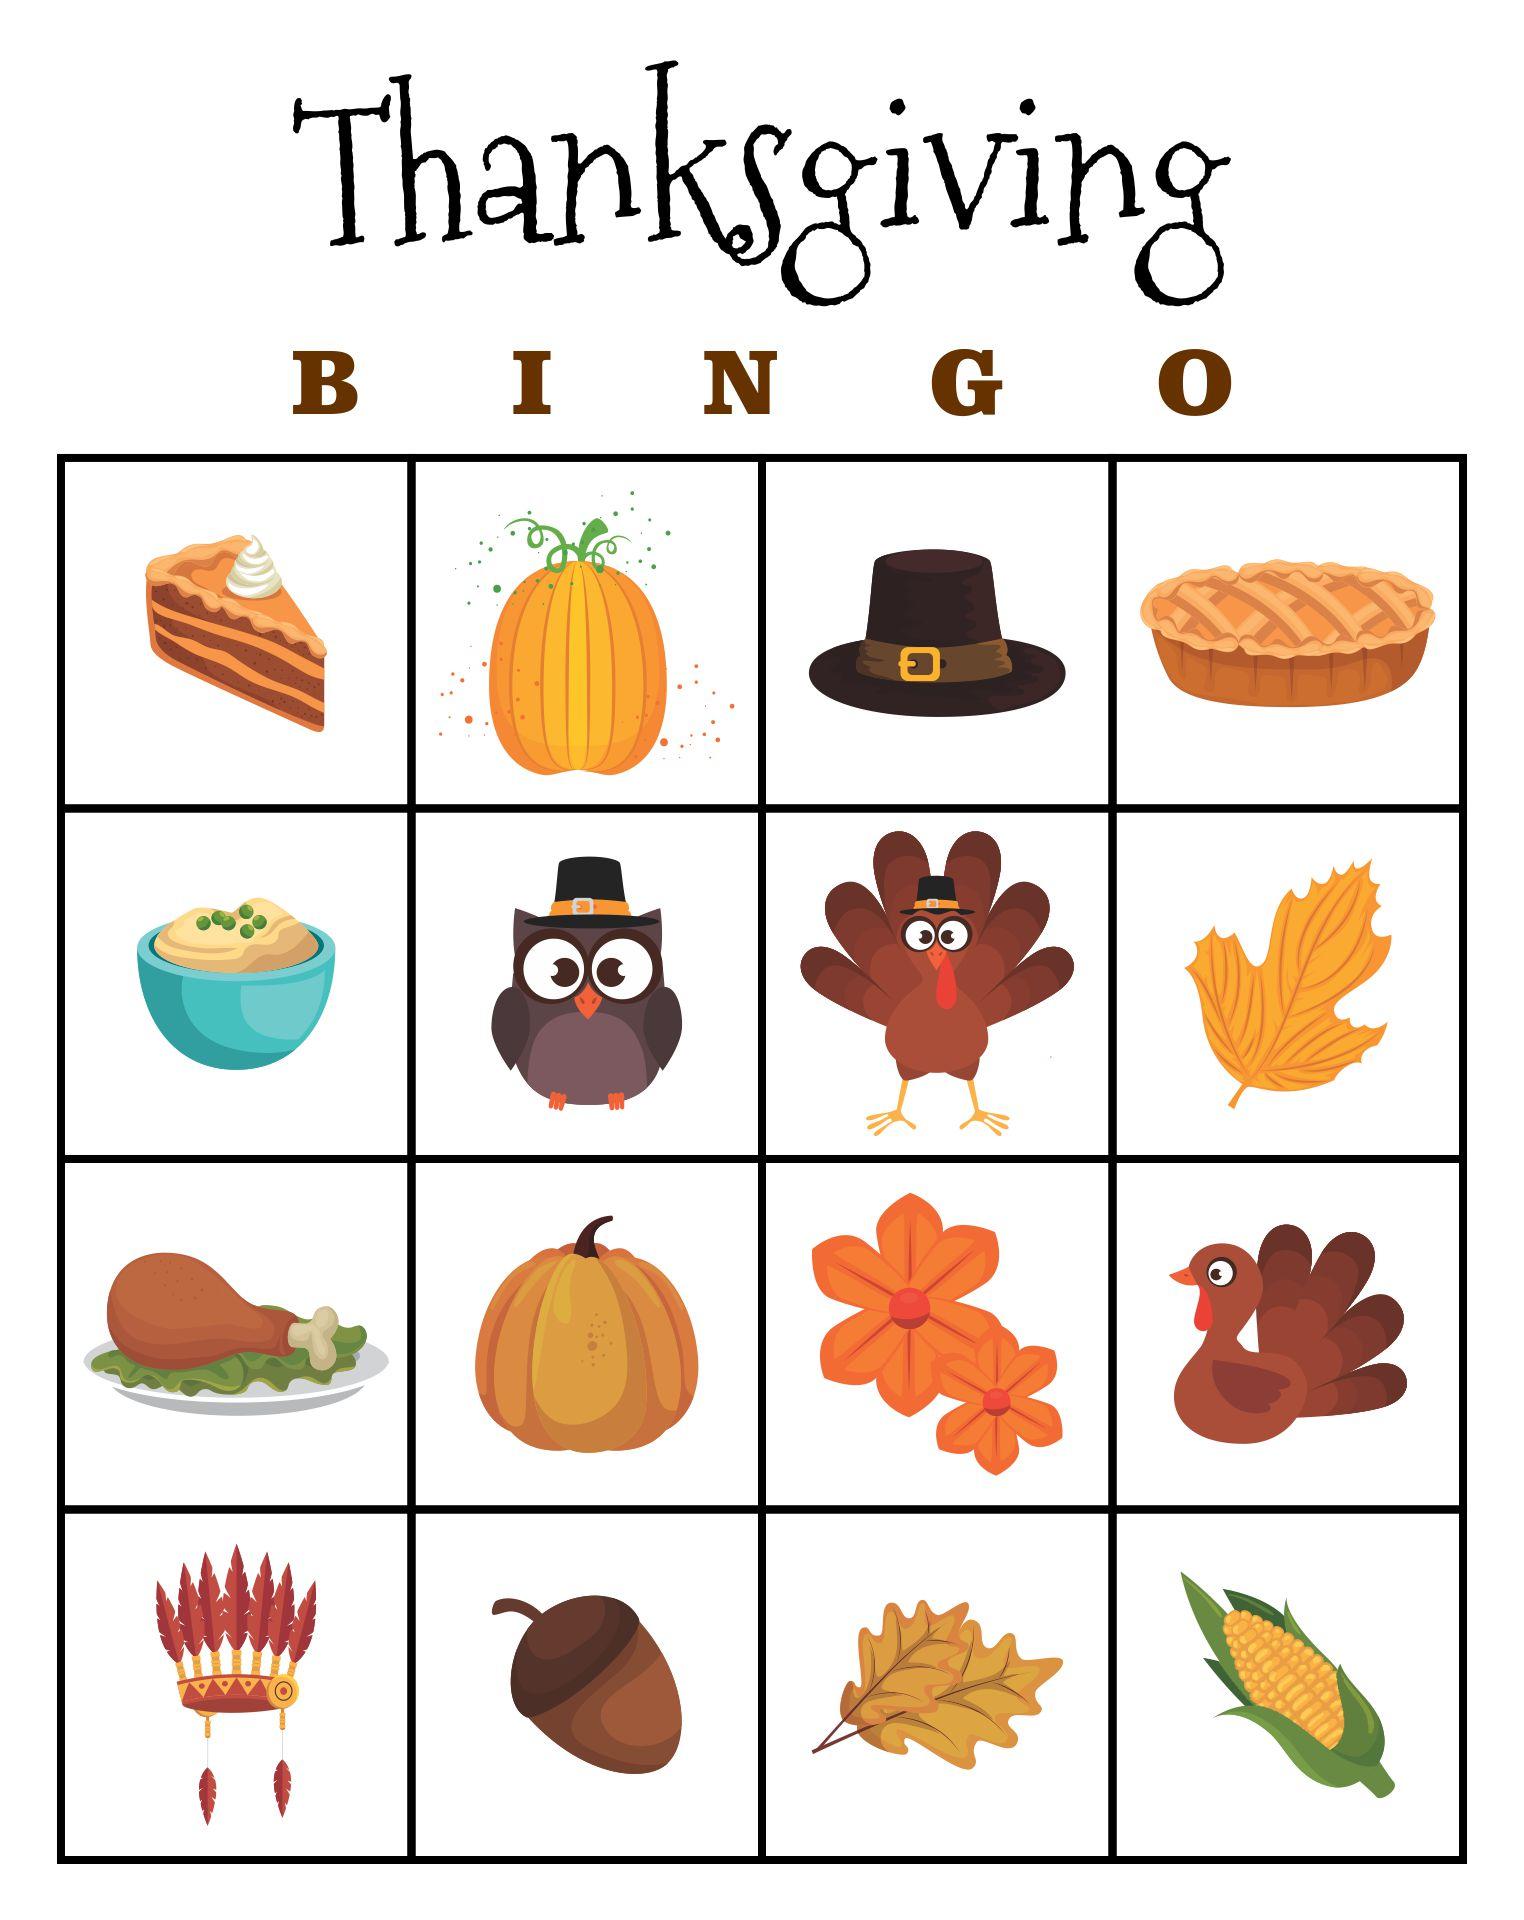 7 Images of Printable Thanksgiving Bingo